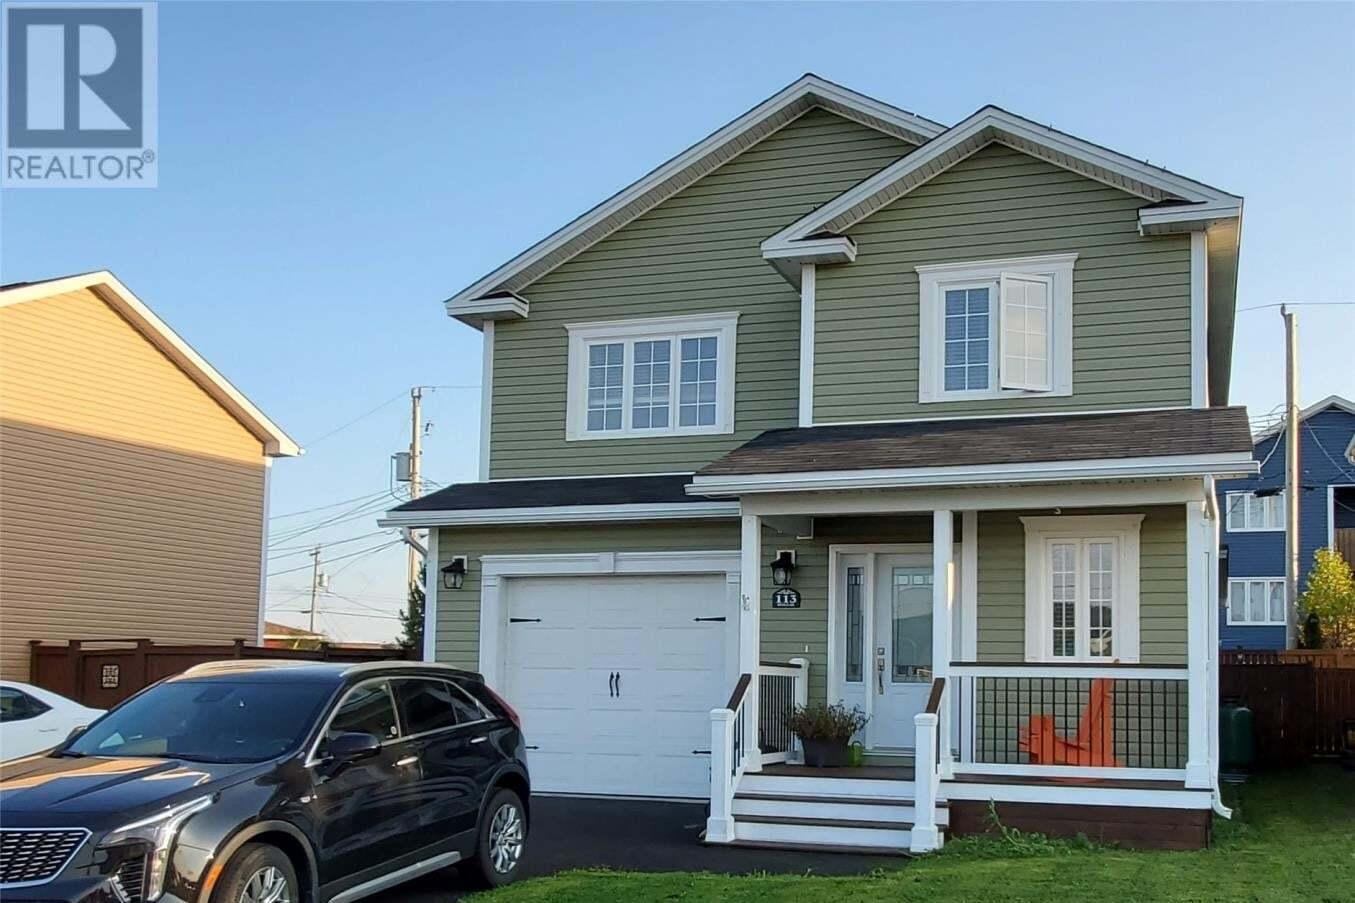 House for sale at 113 Castle Bridge Dr St. John's Newfoundland - MLS: 1221846